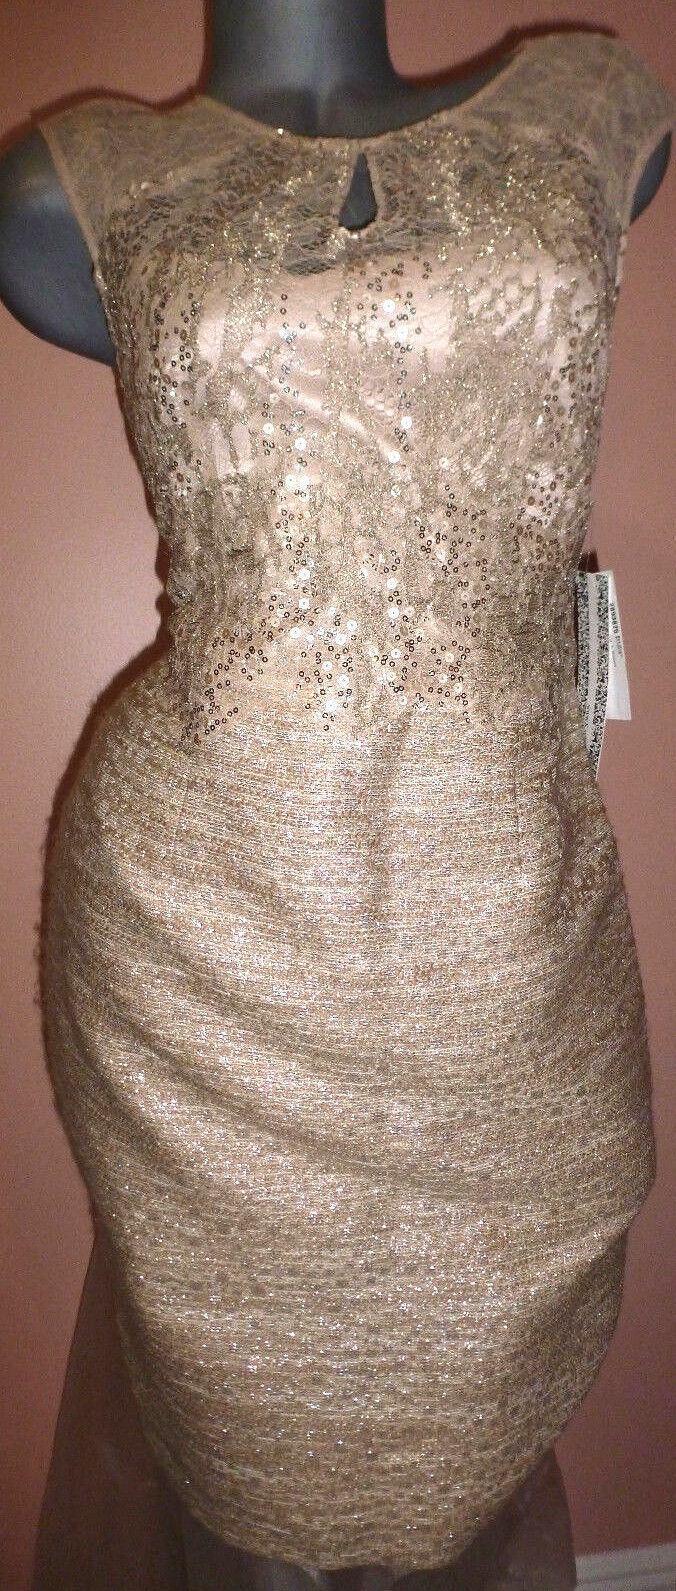 KAY UNGER NEW YORK  SEQUIN WOMAN'S DRESS SZ-6 NWT